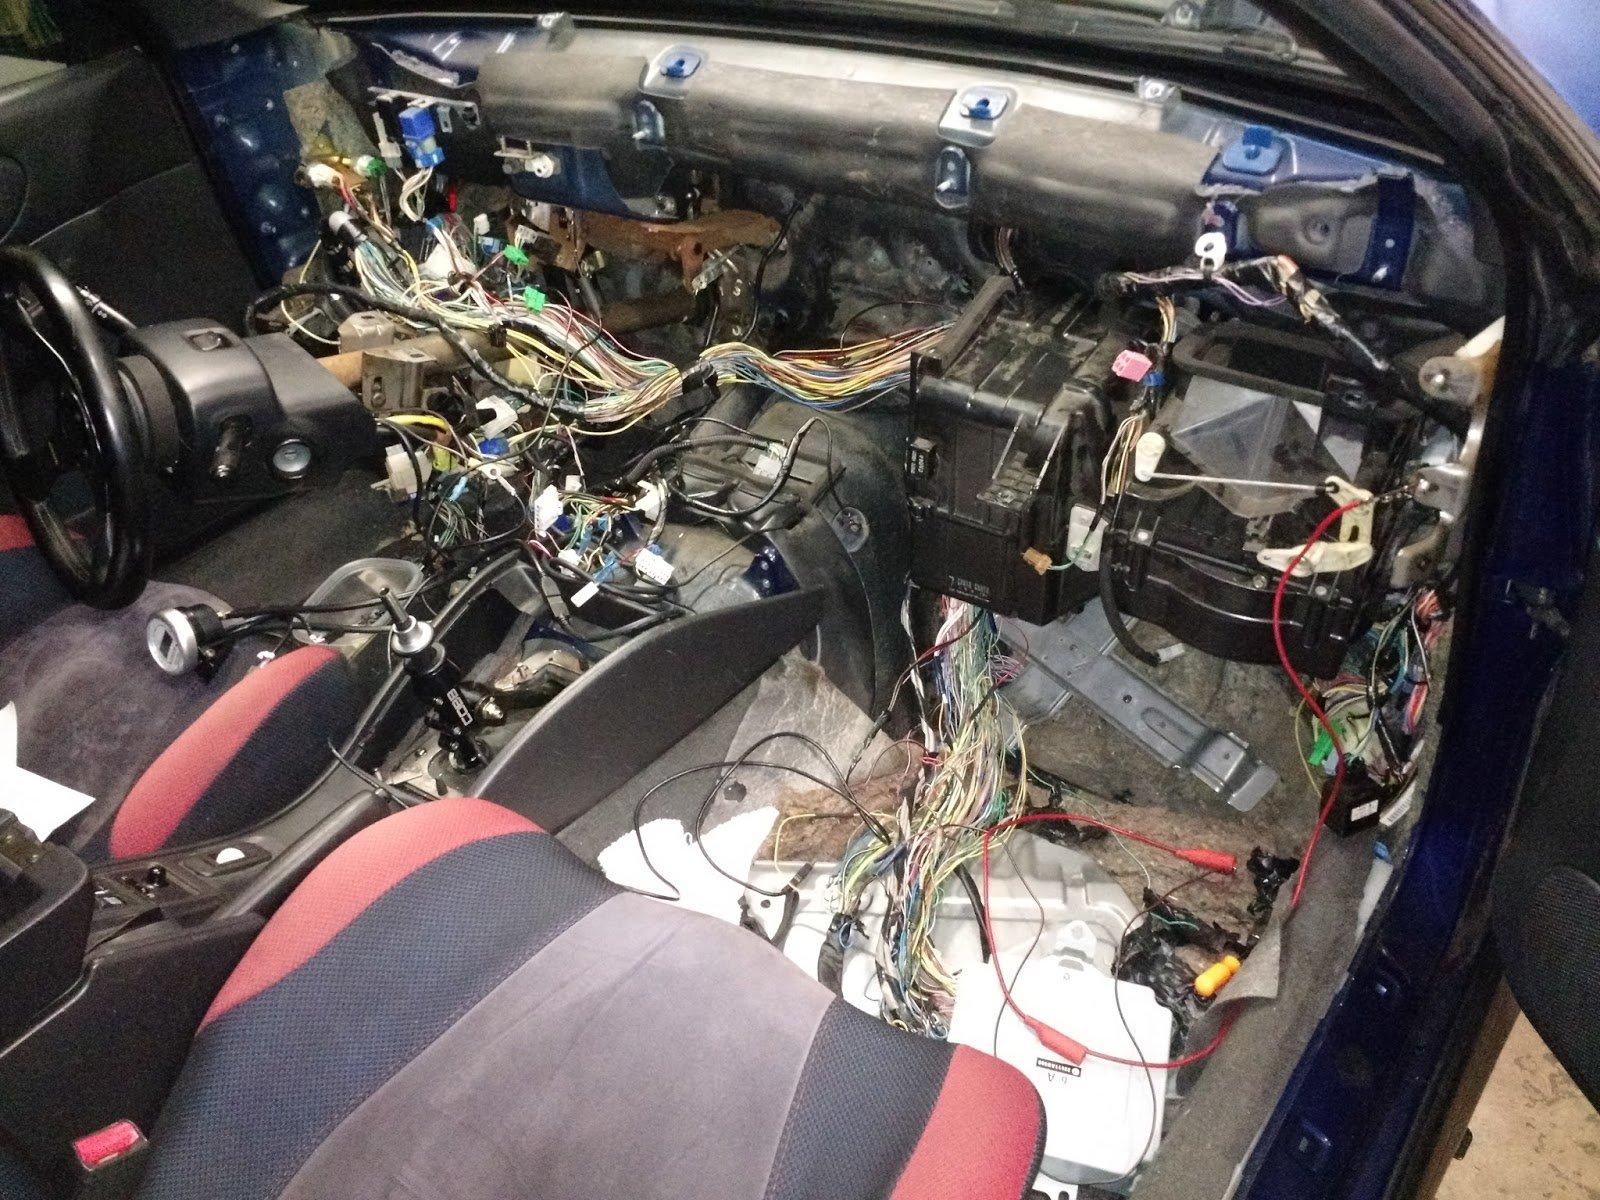 2001 RS with ej207 swap | Page 5 | Subaru Impreza GC8 & RS